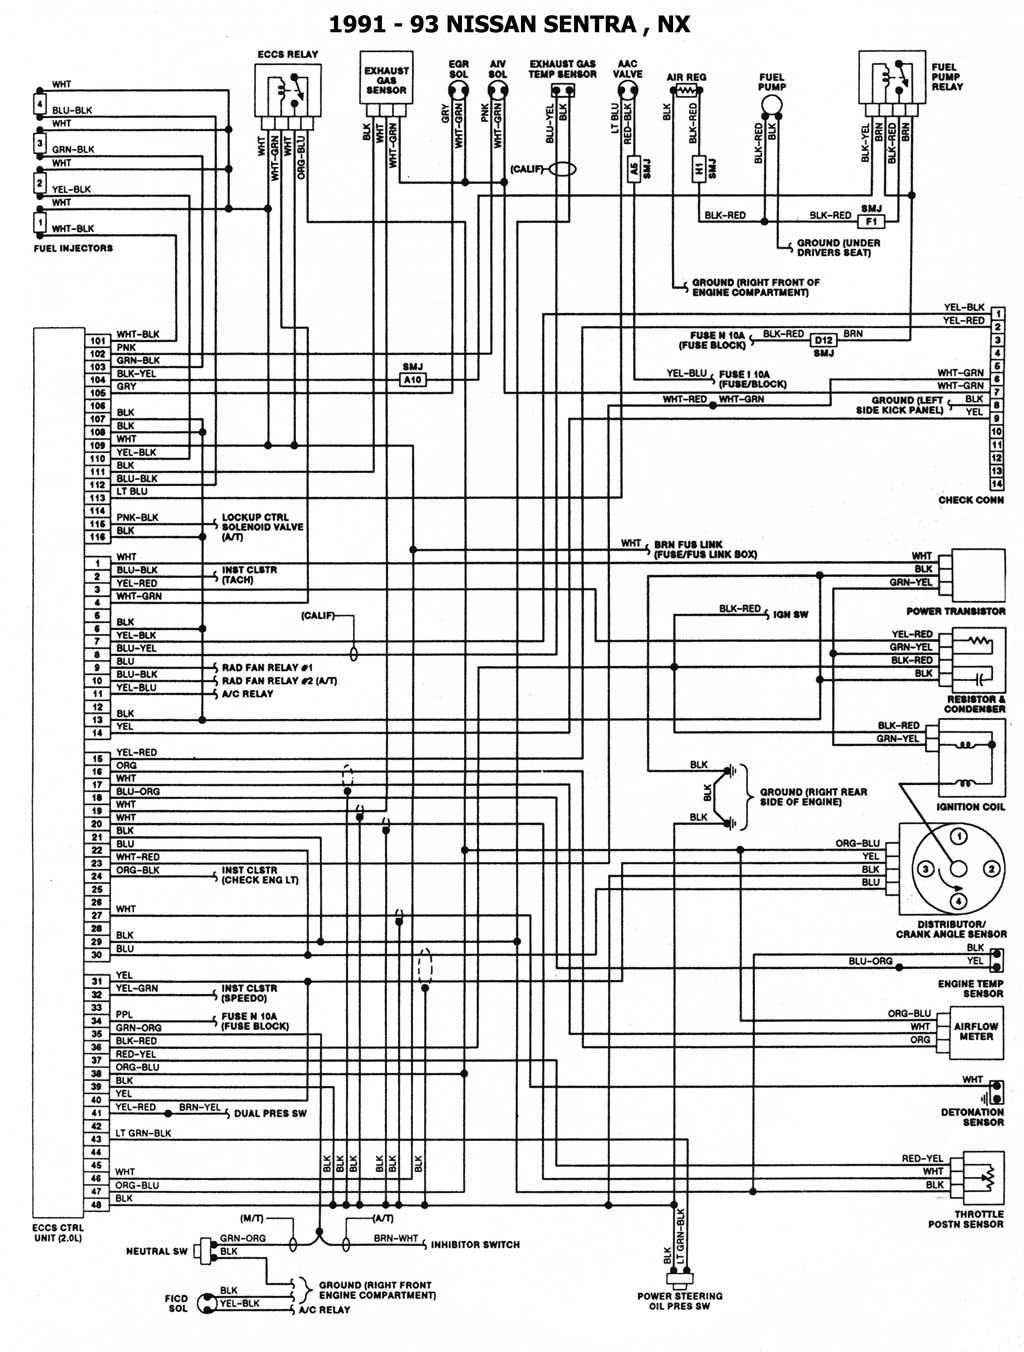 diagrama electrico nissan sentra 98. Black Bedroom Furniture Sets. Home Design Ideas